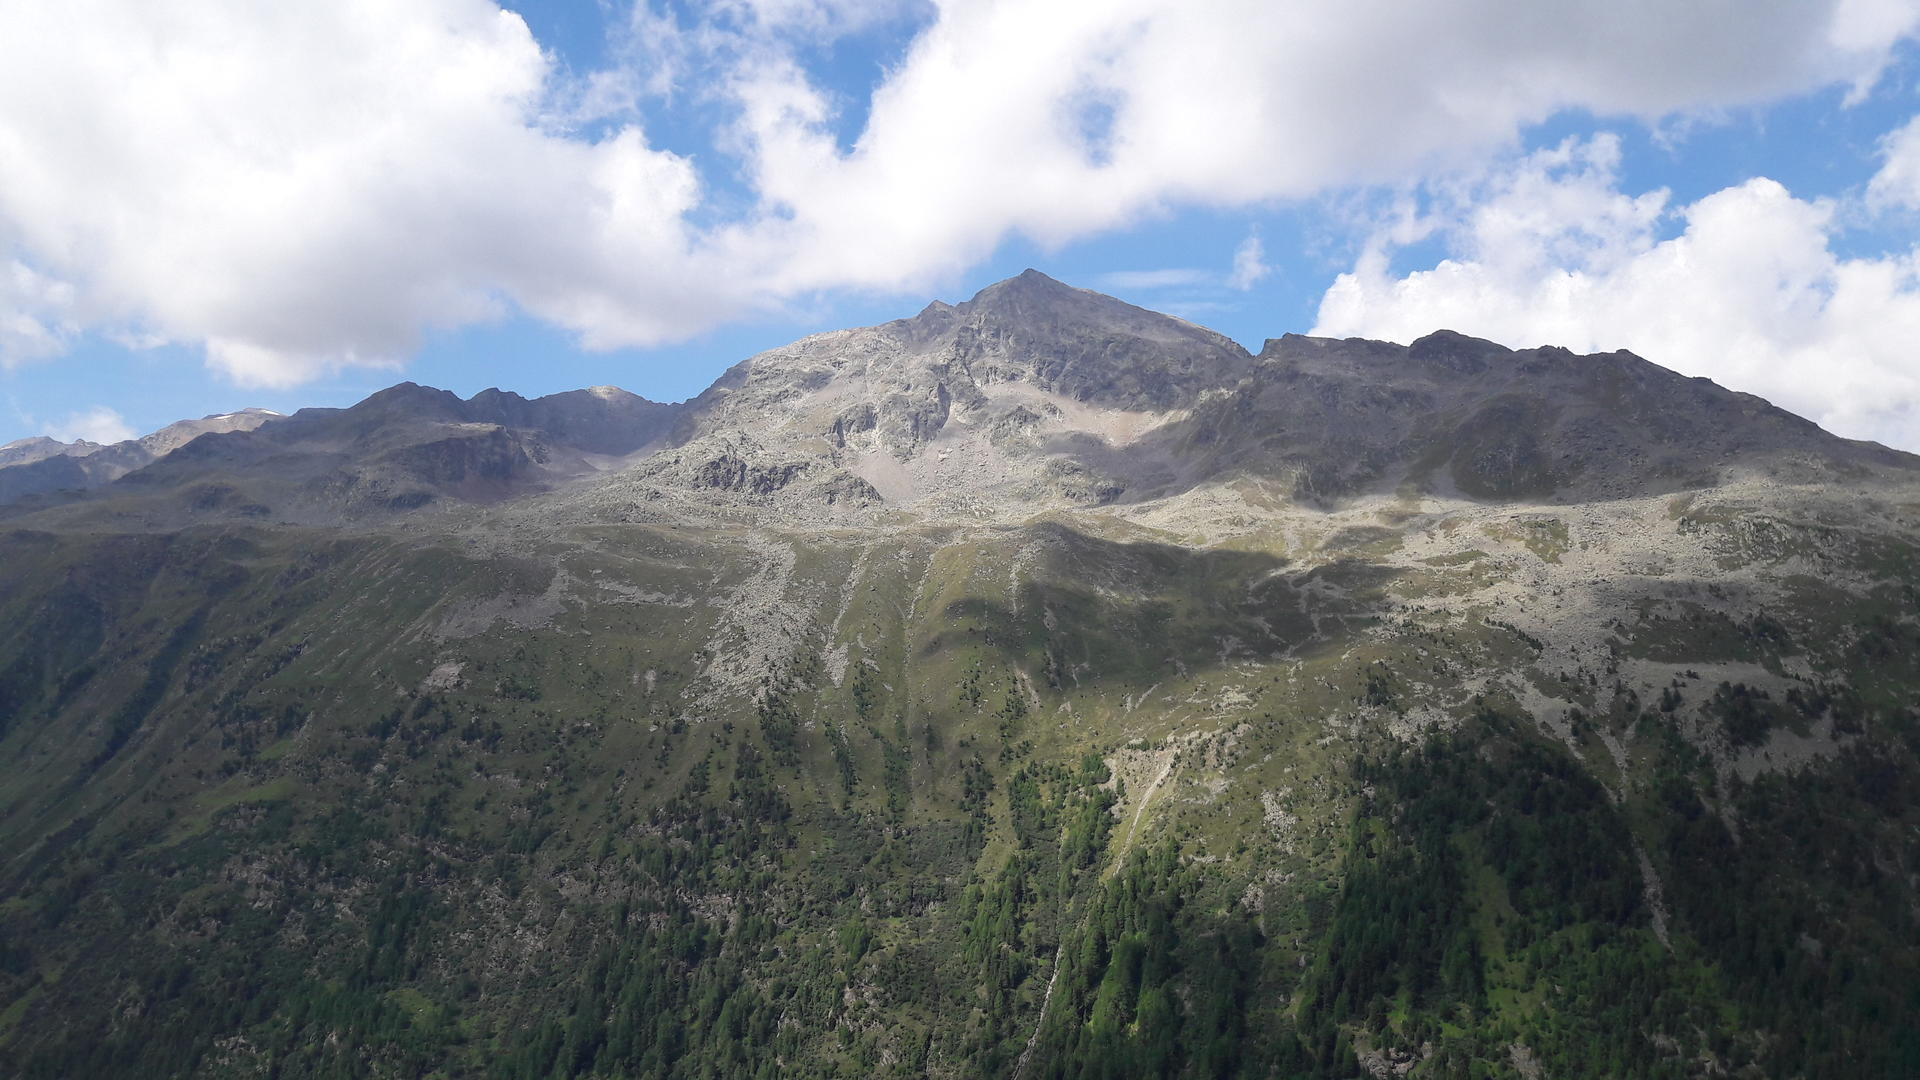 Berge,Berge,Berge.........